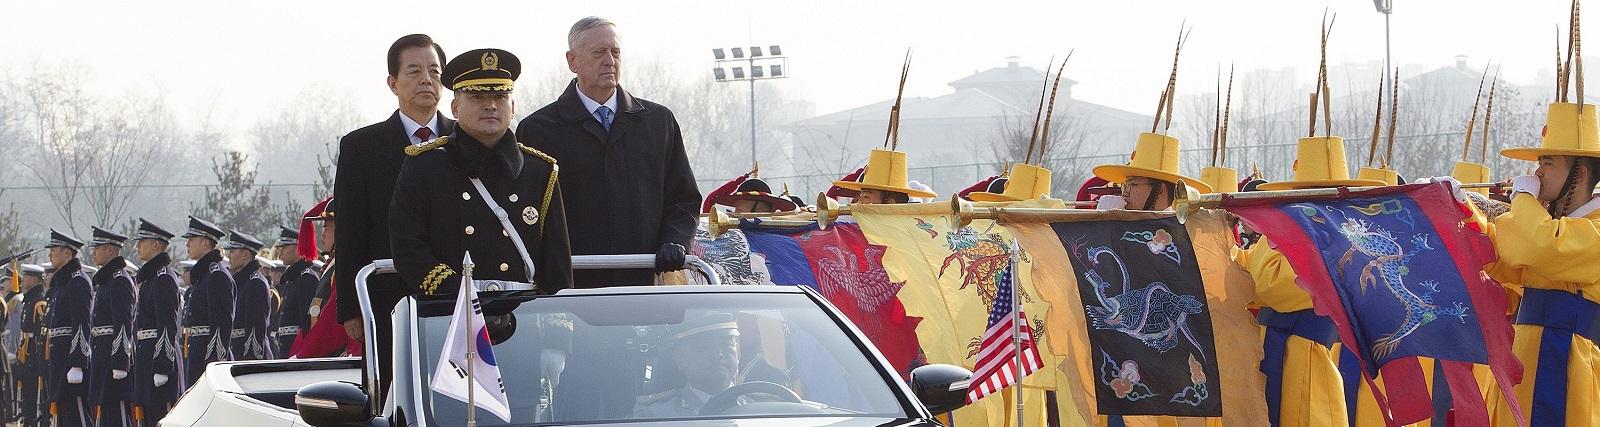 US Defense Secretary James Mattis with his South Korean counterpart Han Min-Koo in Seoul on 3 February. (Photo: Kim Jong Hyun /Getty Images)